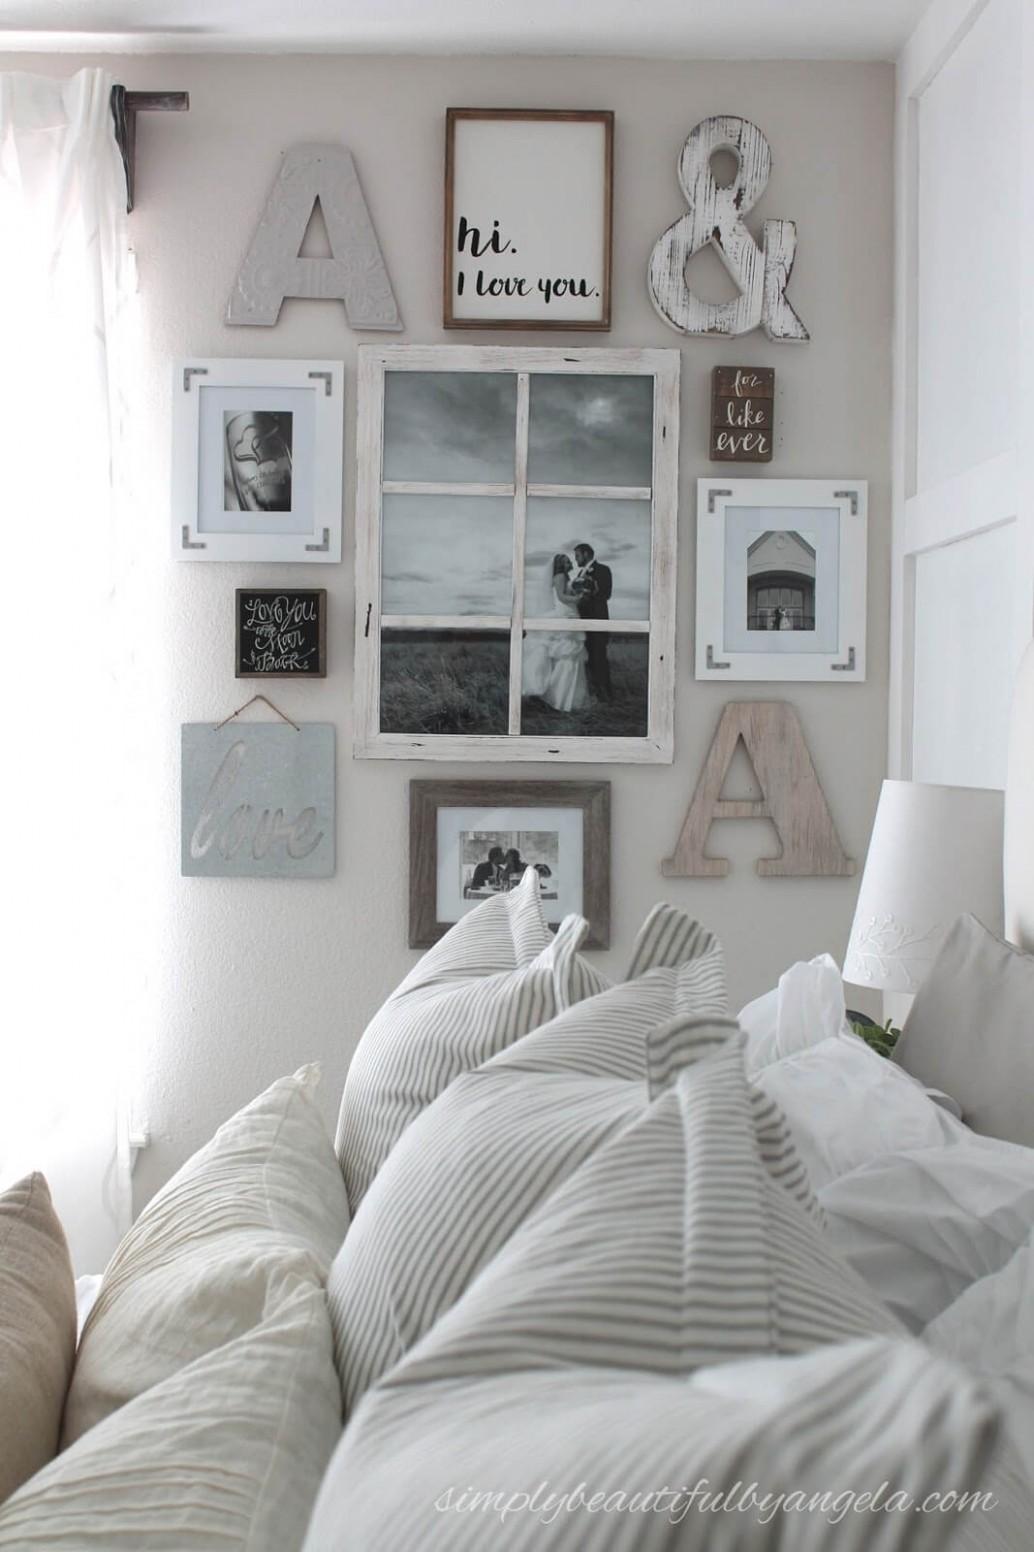 Collection Love Memories Window Best Bedroom Wall Decor Ideas  - Bedroom Ideas For Women